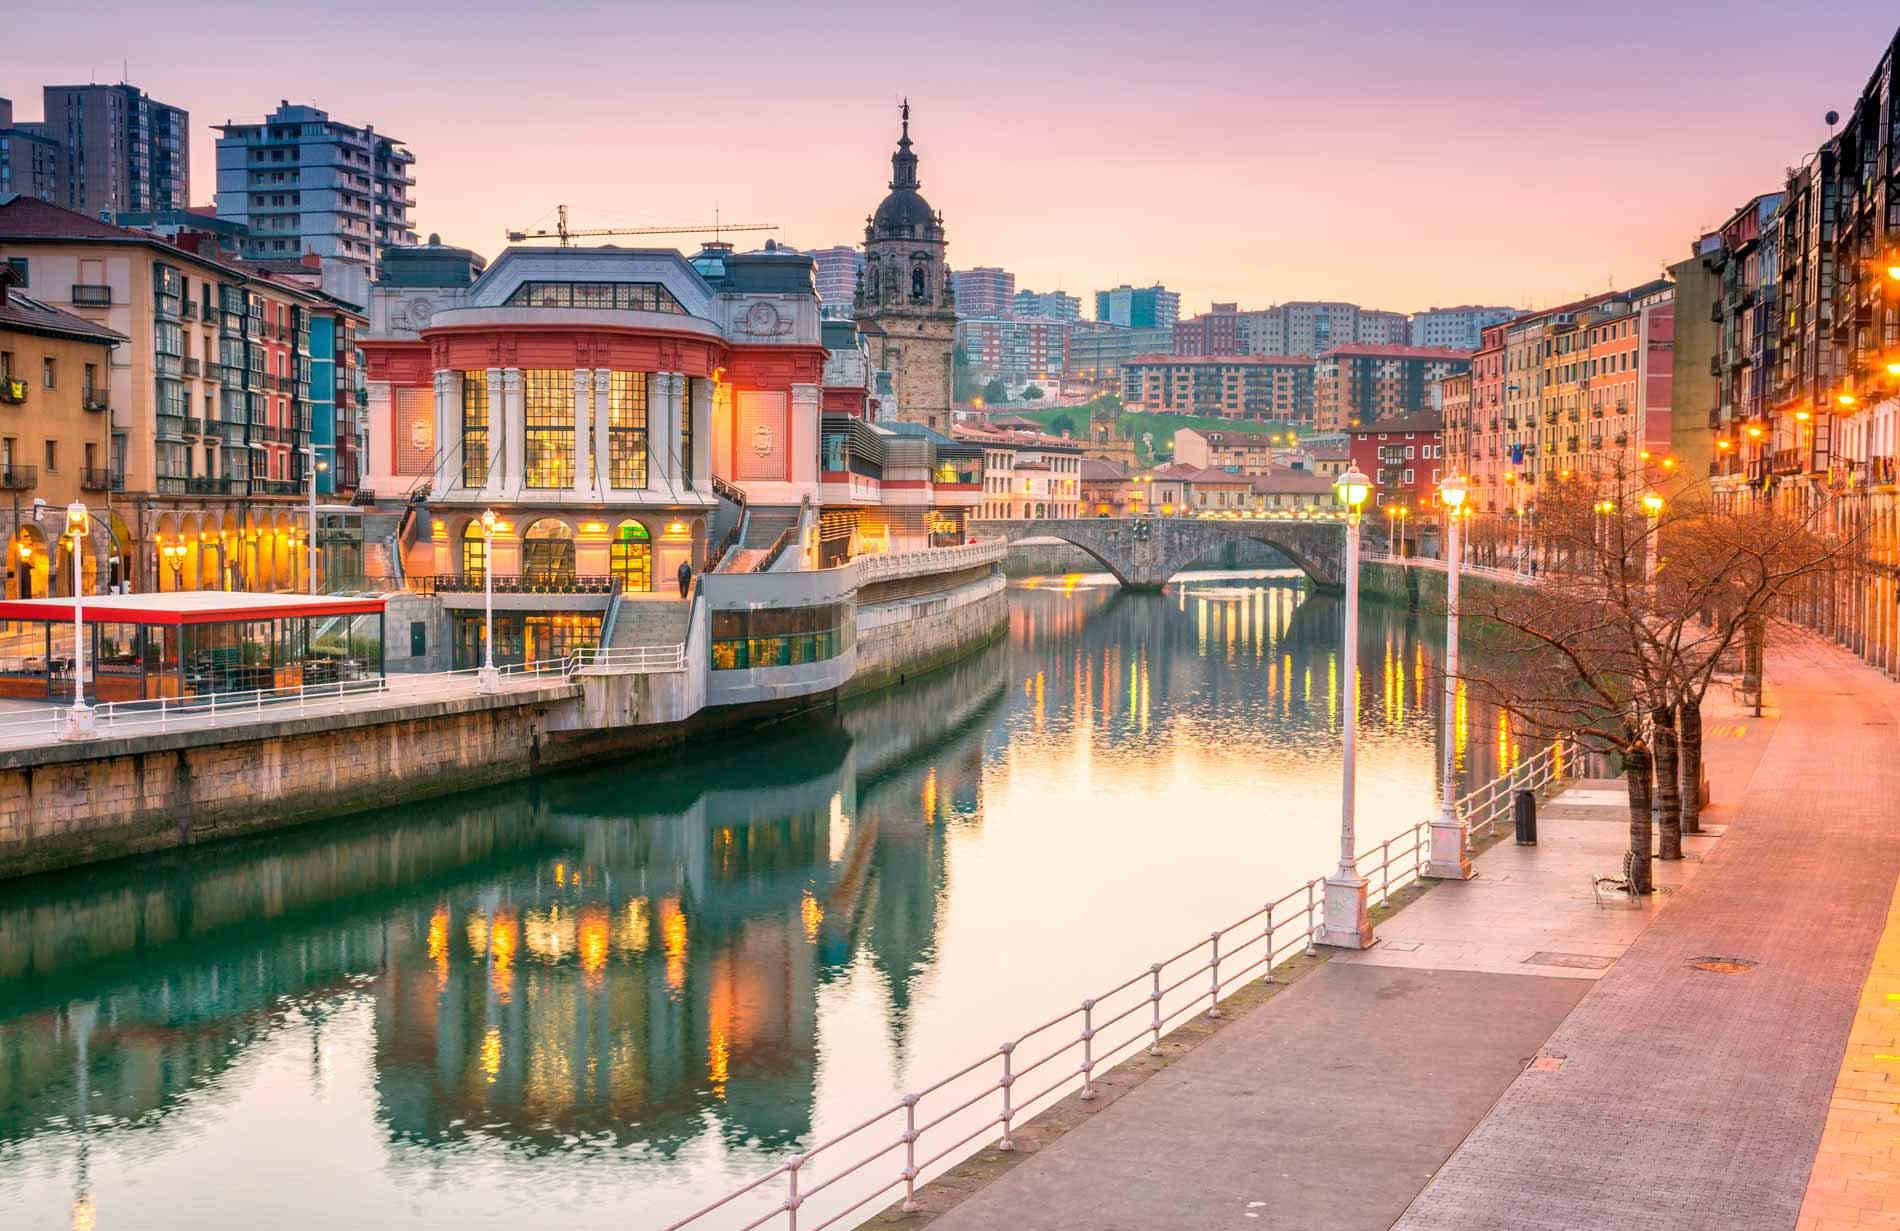 Cosa vedere a Bilbao: veduta del lungofiume di Bilbao ©Erasmusu.com